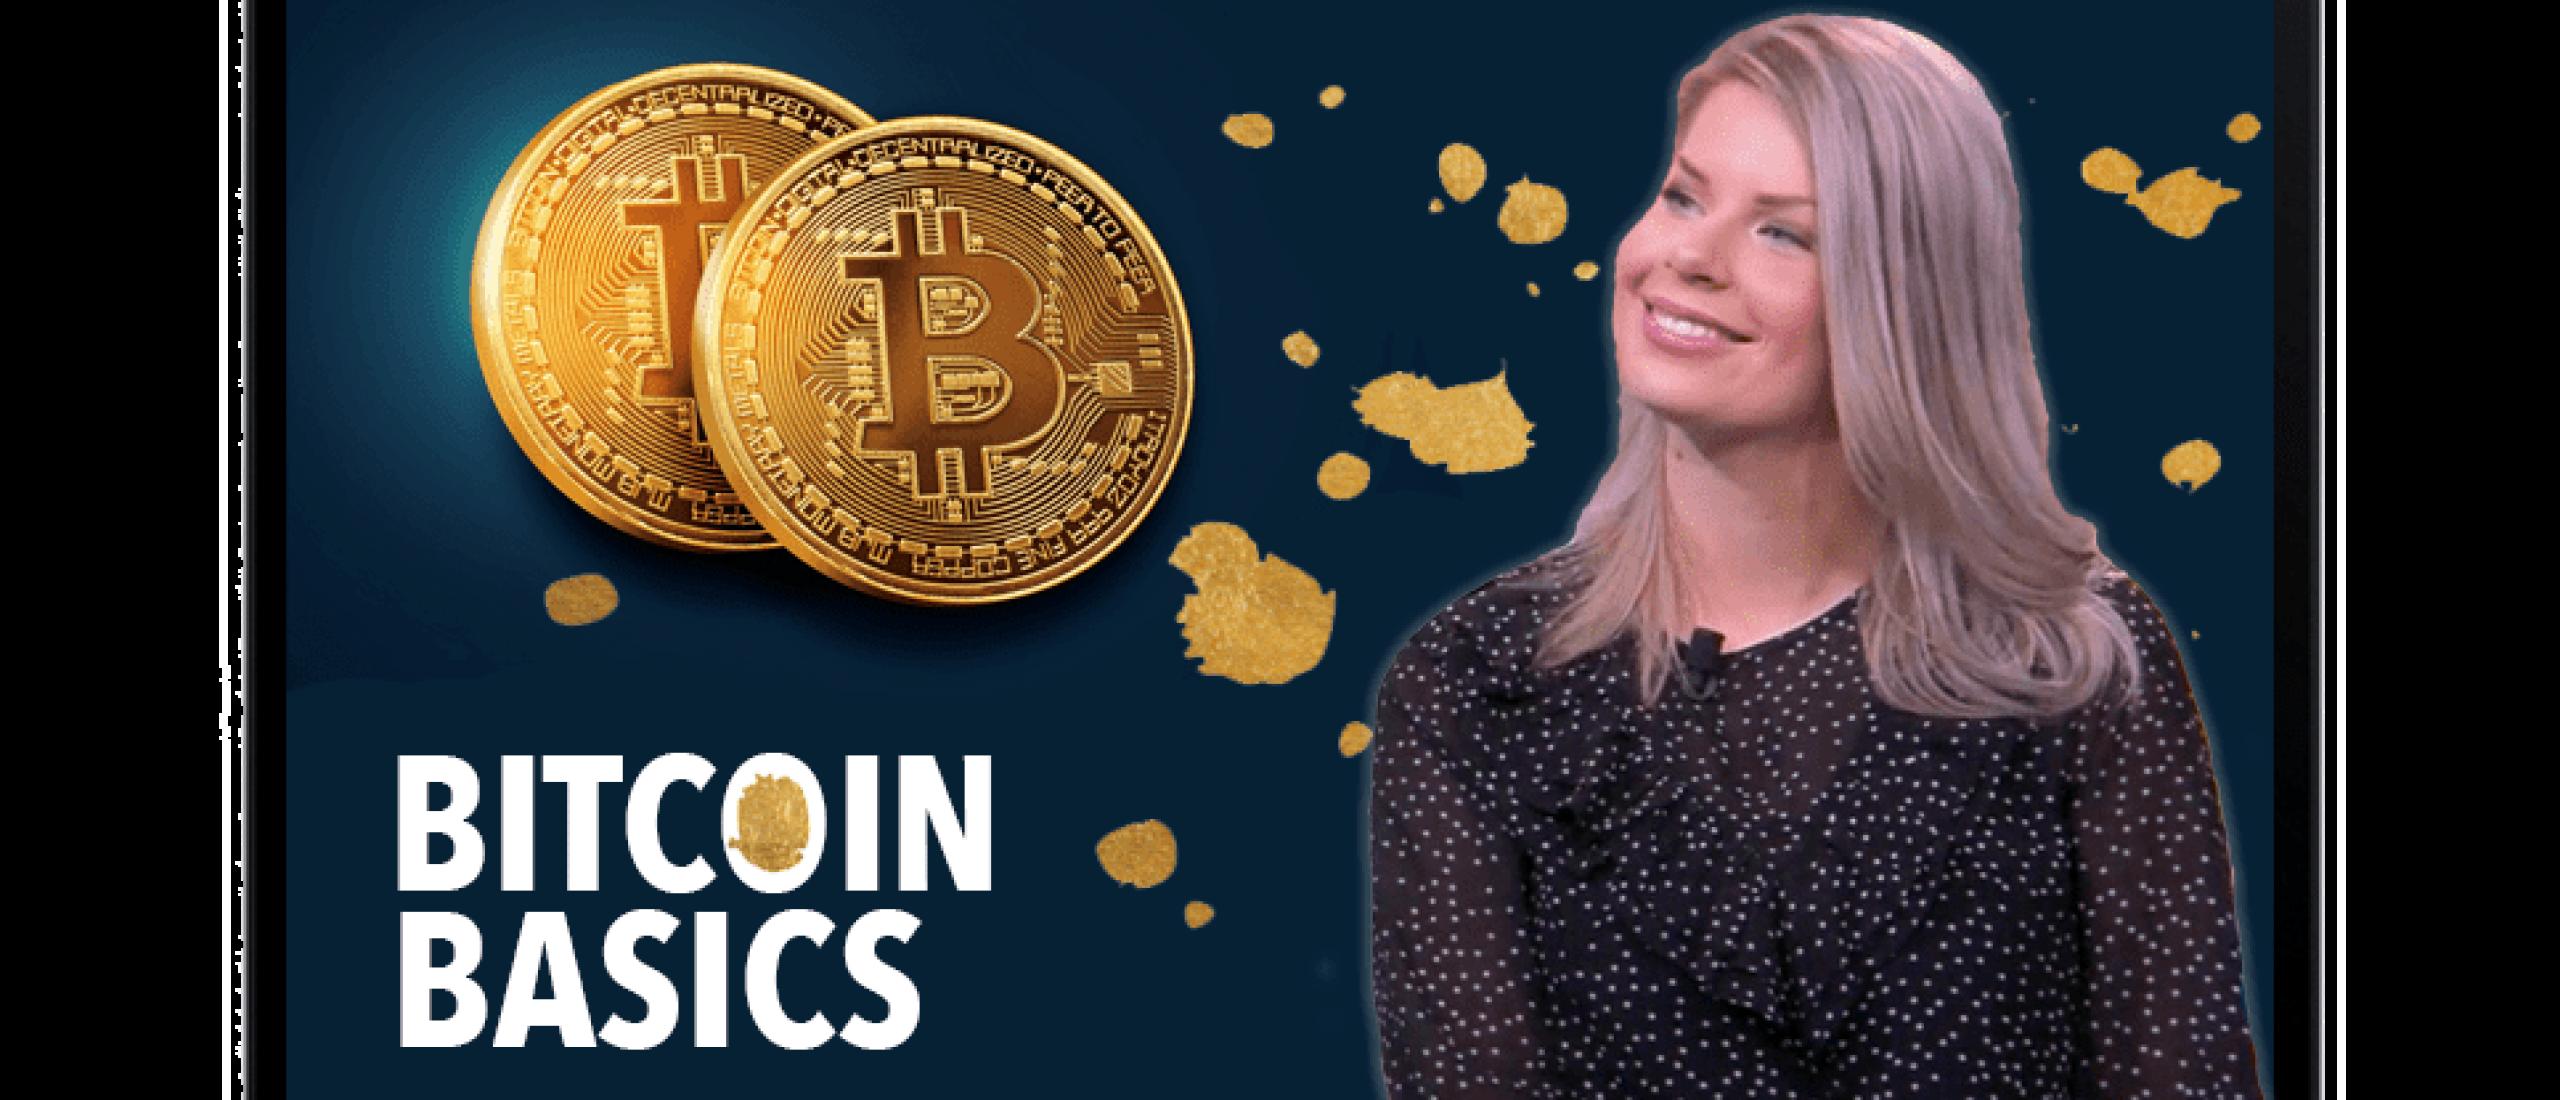 Review: Bitcoin Basics & Crypto cursus van Madelon Vos